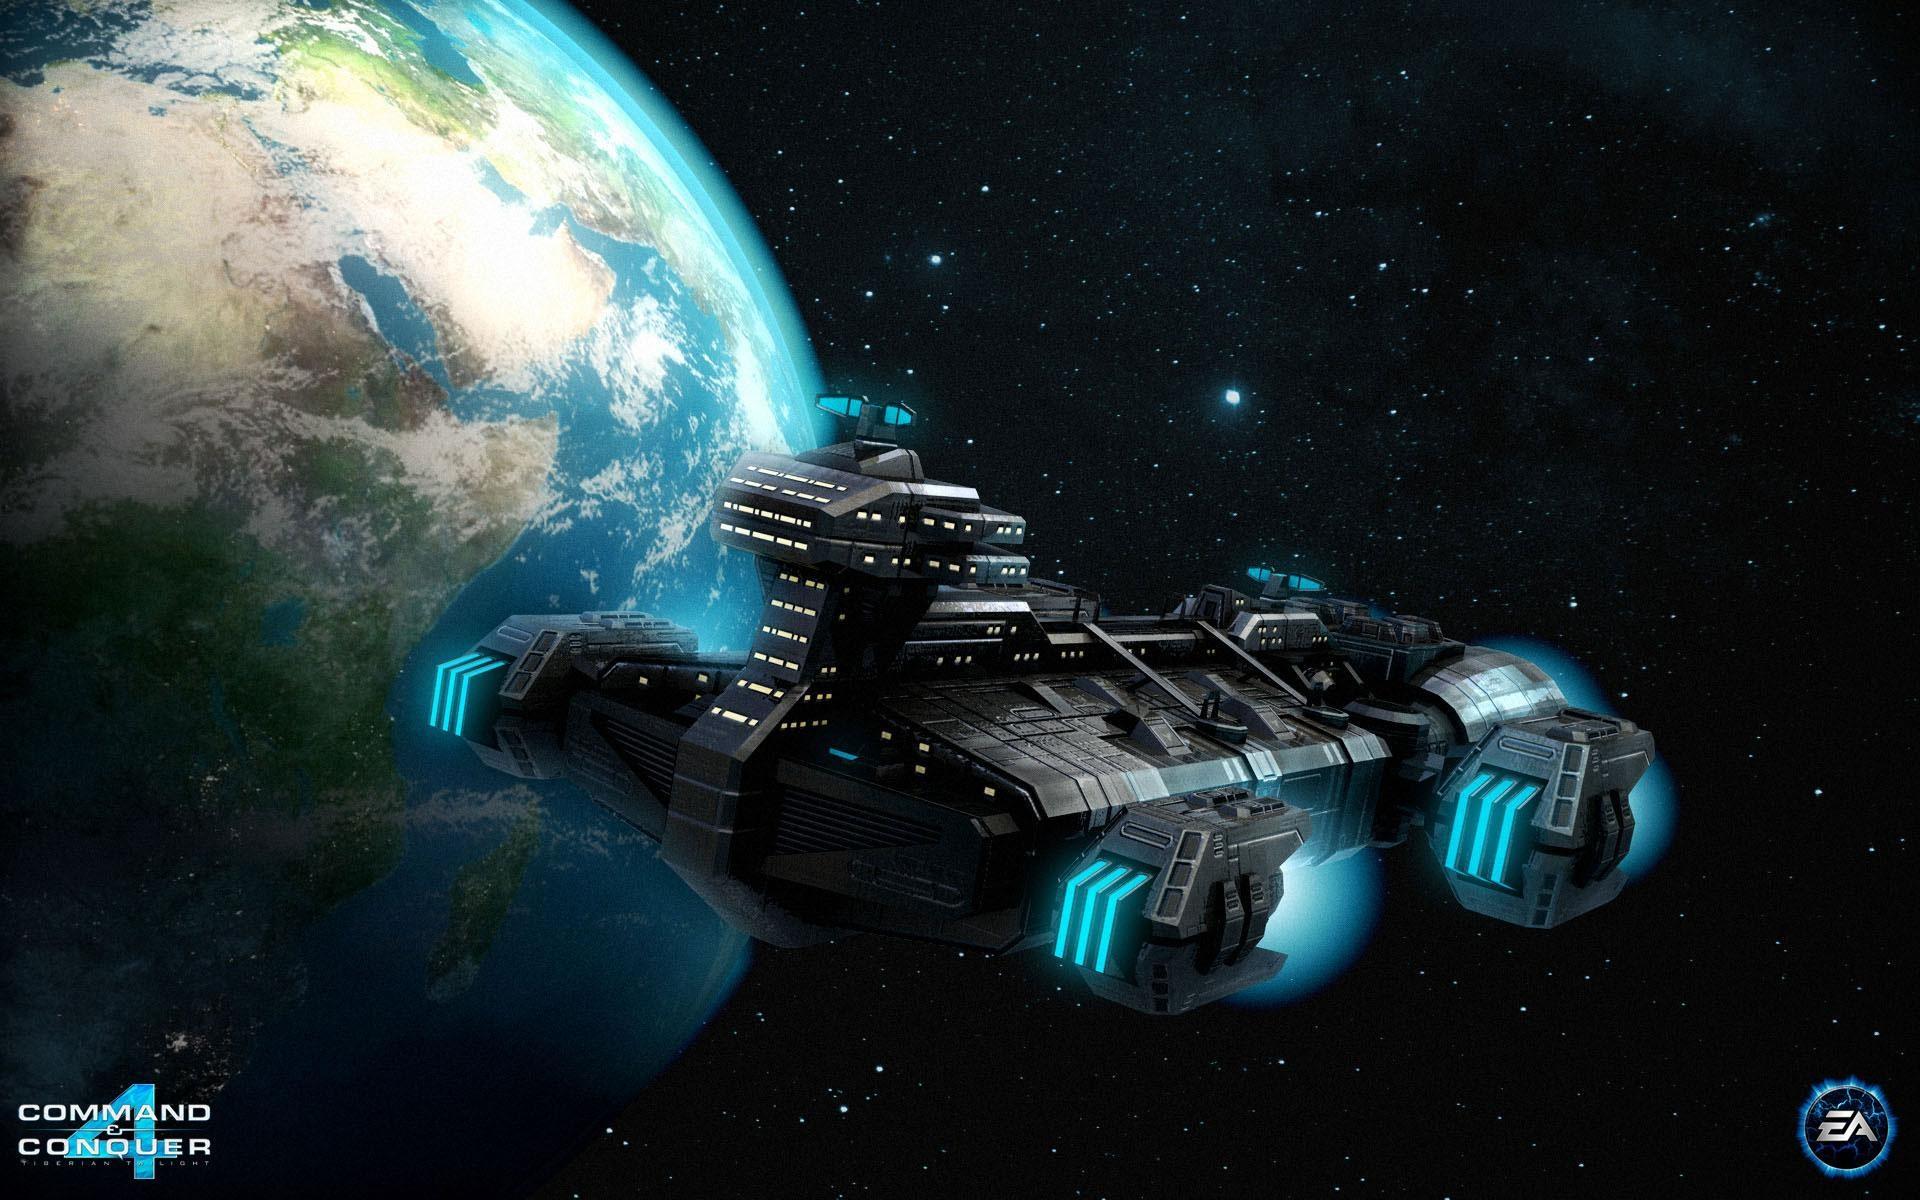 Command Conquer 4 Tiberian Twilight features